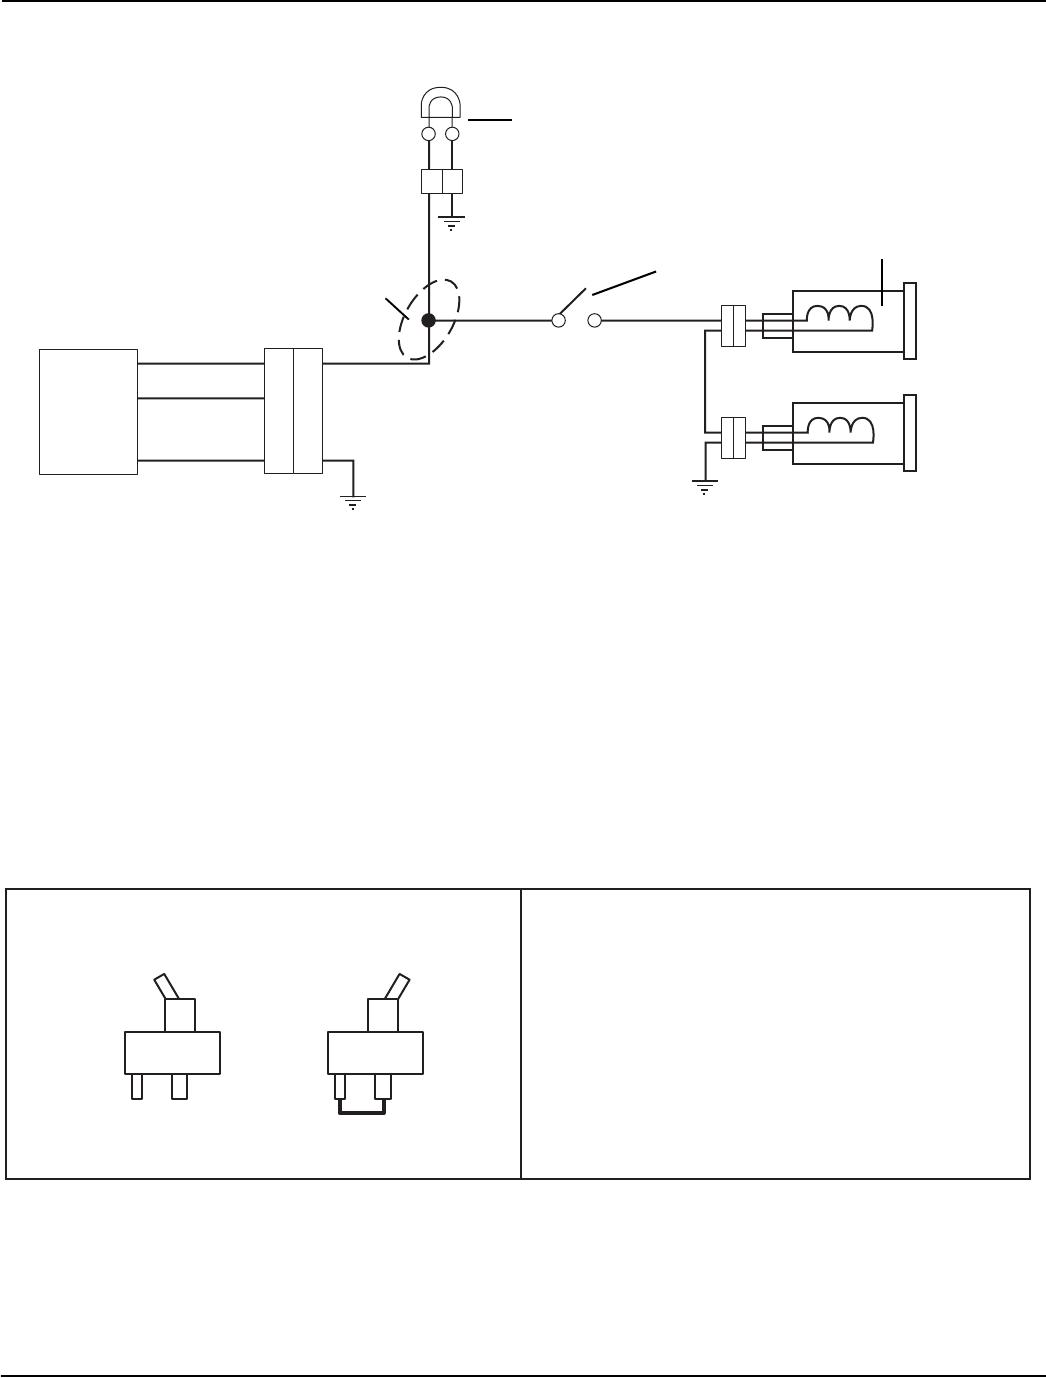 Ariens 926001 926le 926002 11528le 926003 1332le 926004 Wiring Diagram For Snowblower 1 00487500 Headlight Assembly Halogen 862 37w